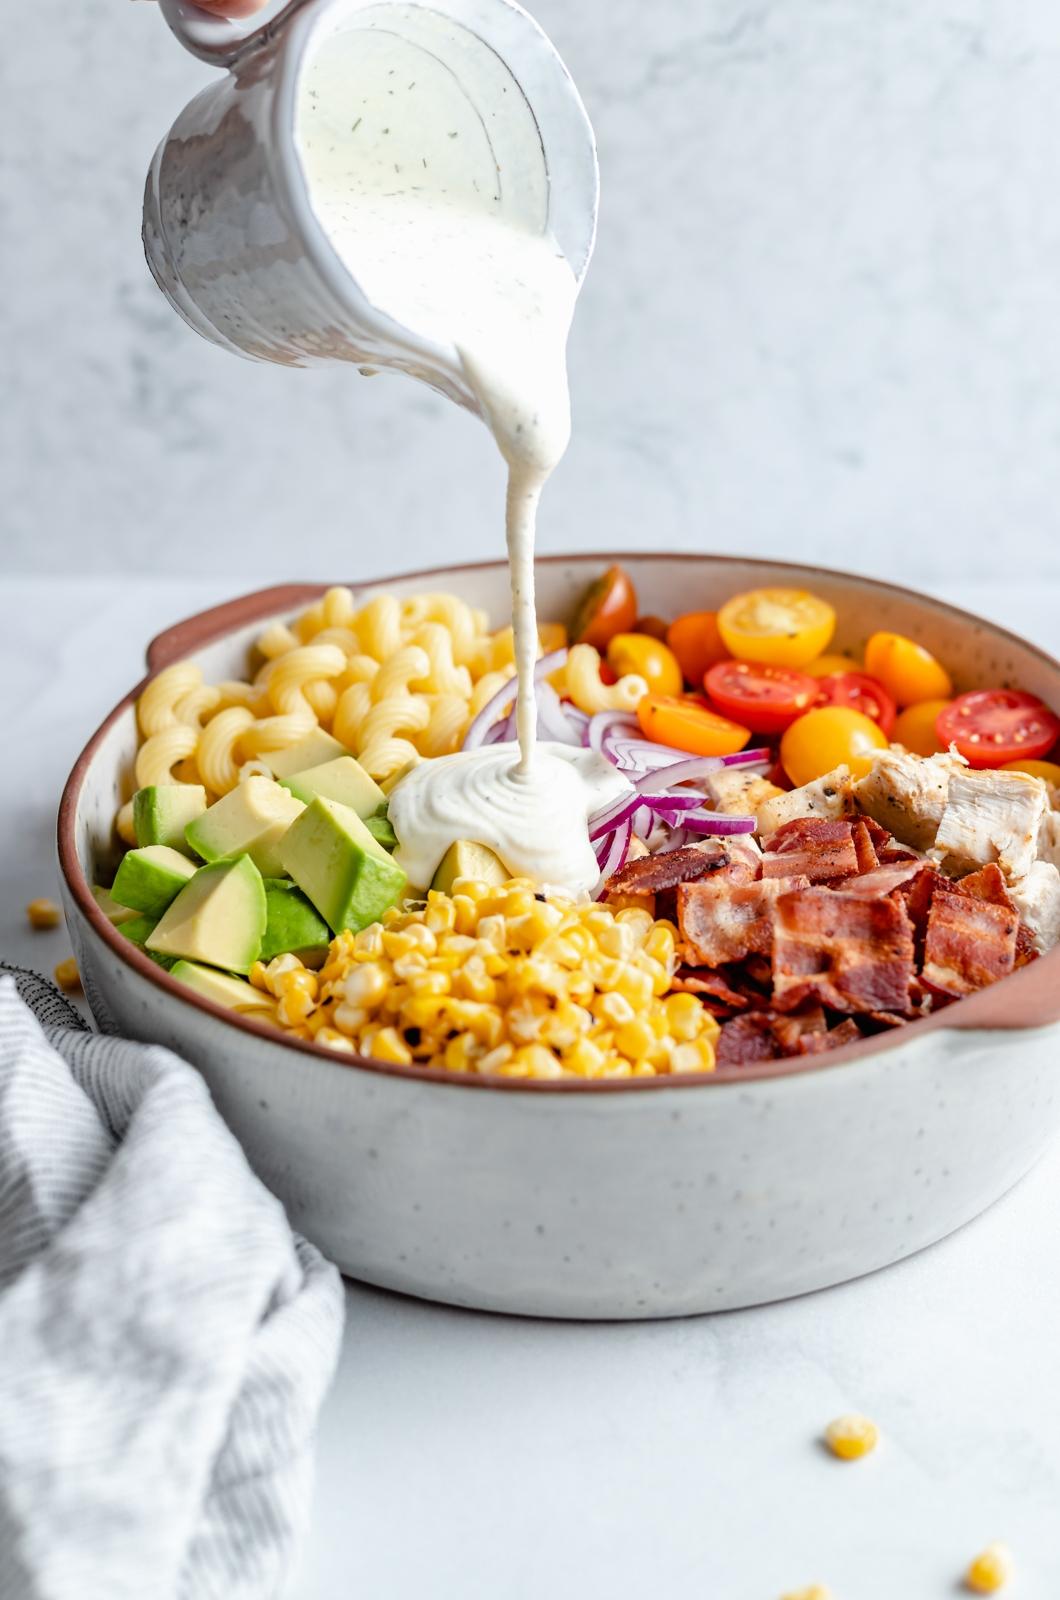 pouring ranch dressing onto a creamy chicken bacon pasta salad